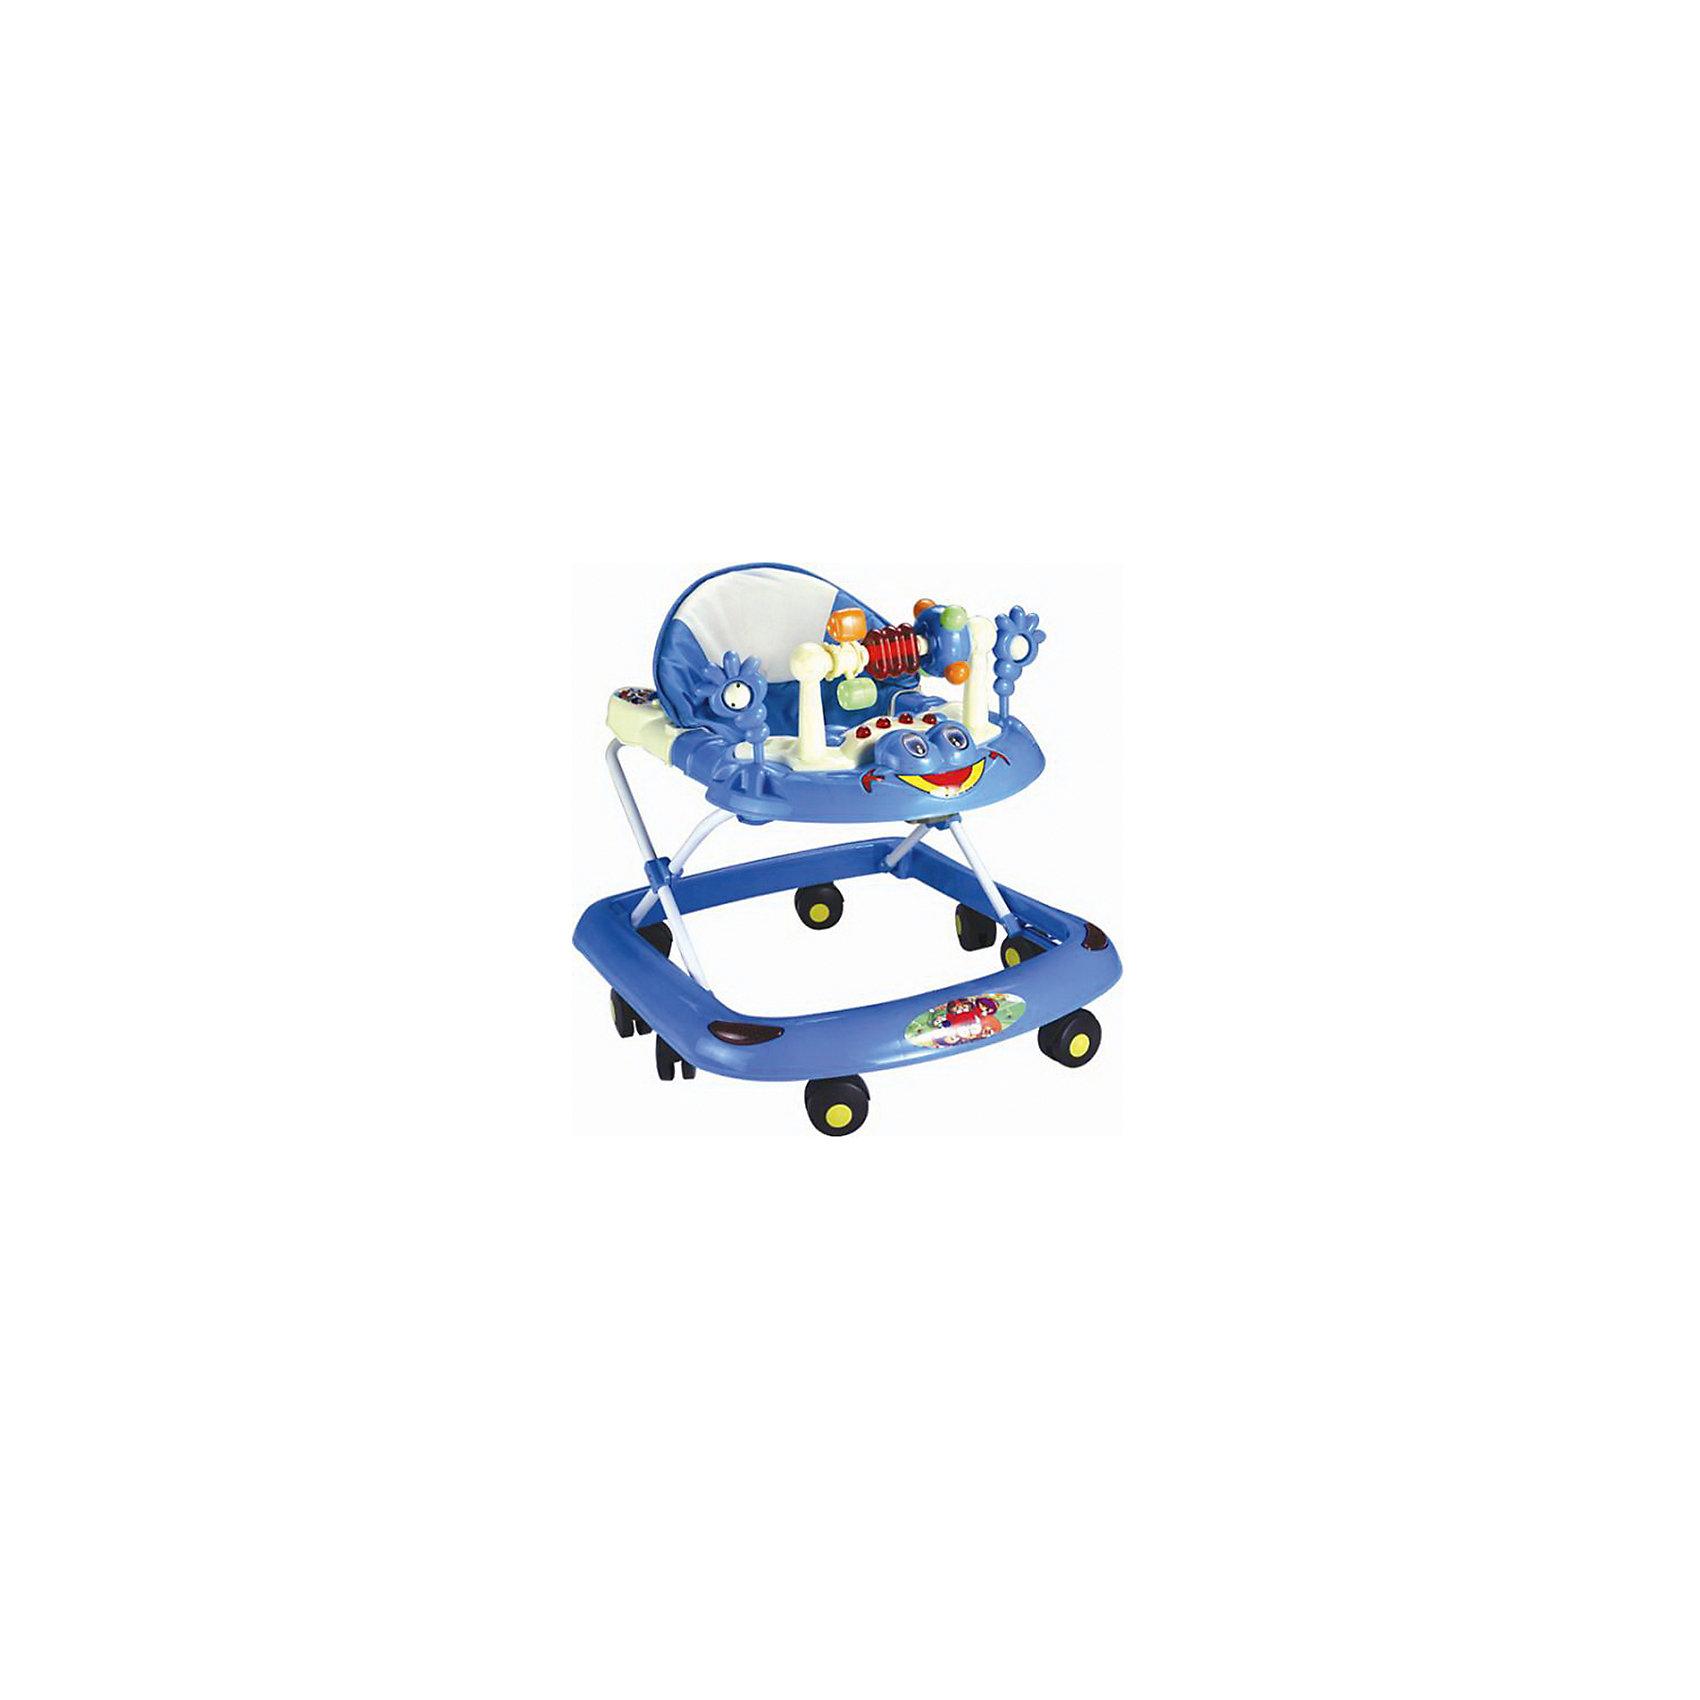 Ходунки Лягушка, Shine Ring, голубойSHINE RING  Ходунки (8 колес,игрушки,муз) 5 шт в кор.(67*60*51), BLUE/ Голубой<br><br>Ширина мм: 670<br>Глубина мм: 600<br>Высота мм: 520<br>Вес г: 2800<br>Возраст от месяцев: 6<br>Возраст до месяцев: 12<br>Пол: Унисекс<br>Возраст: Детский<br>SKU: 5559211